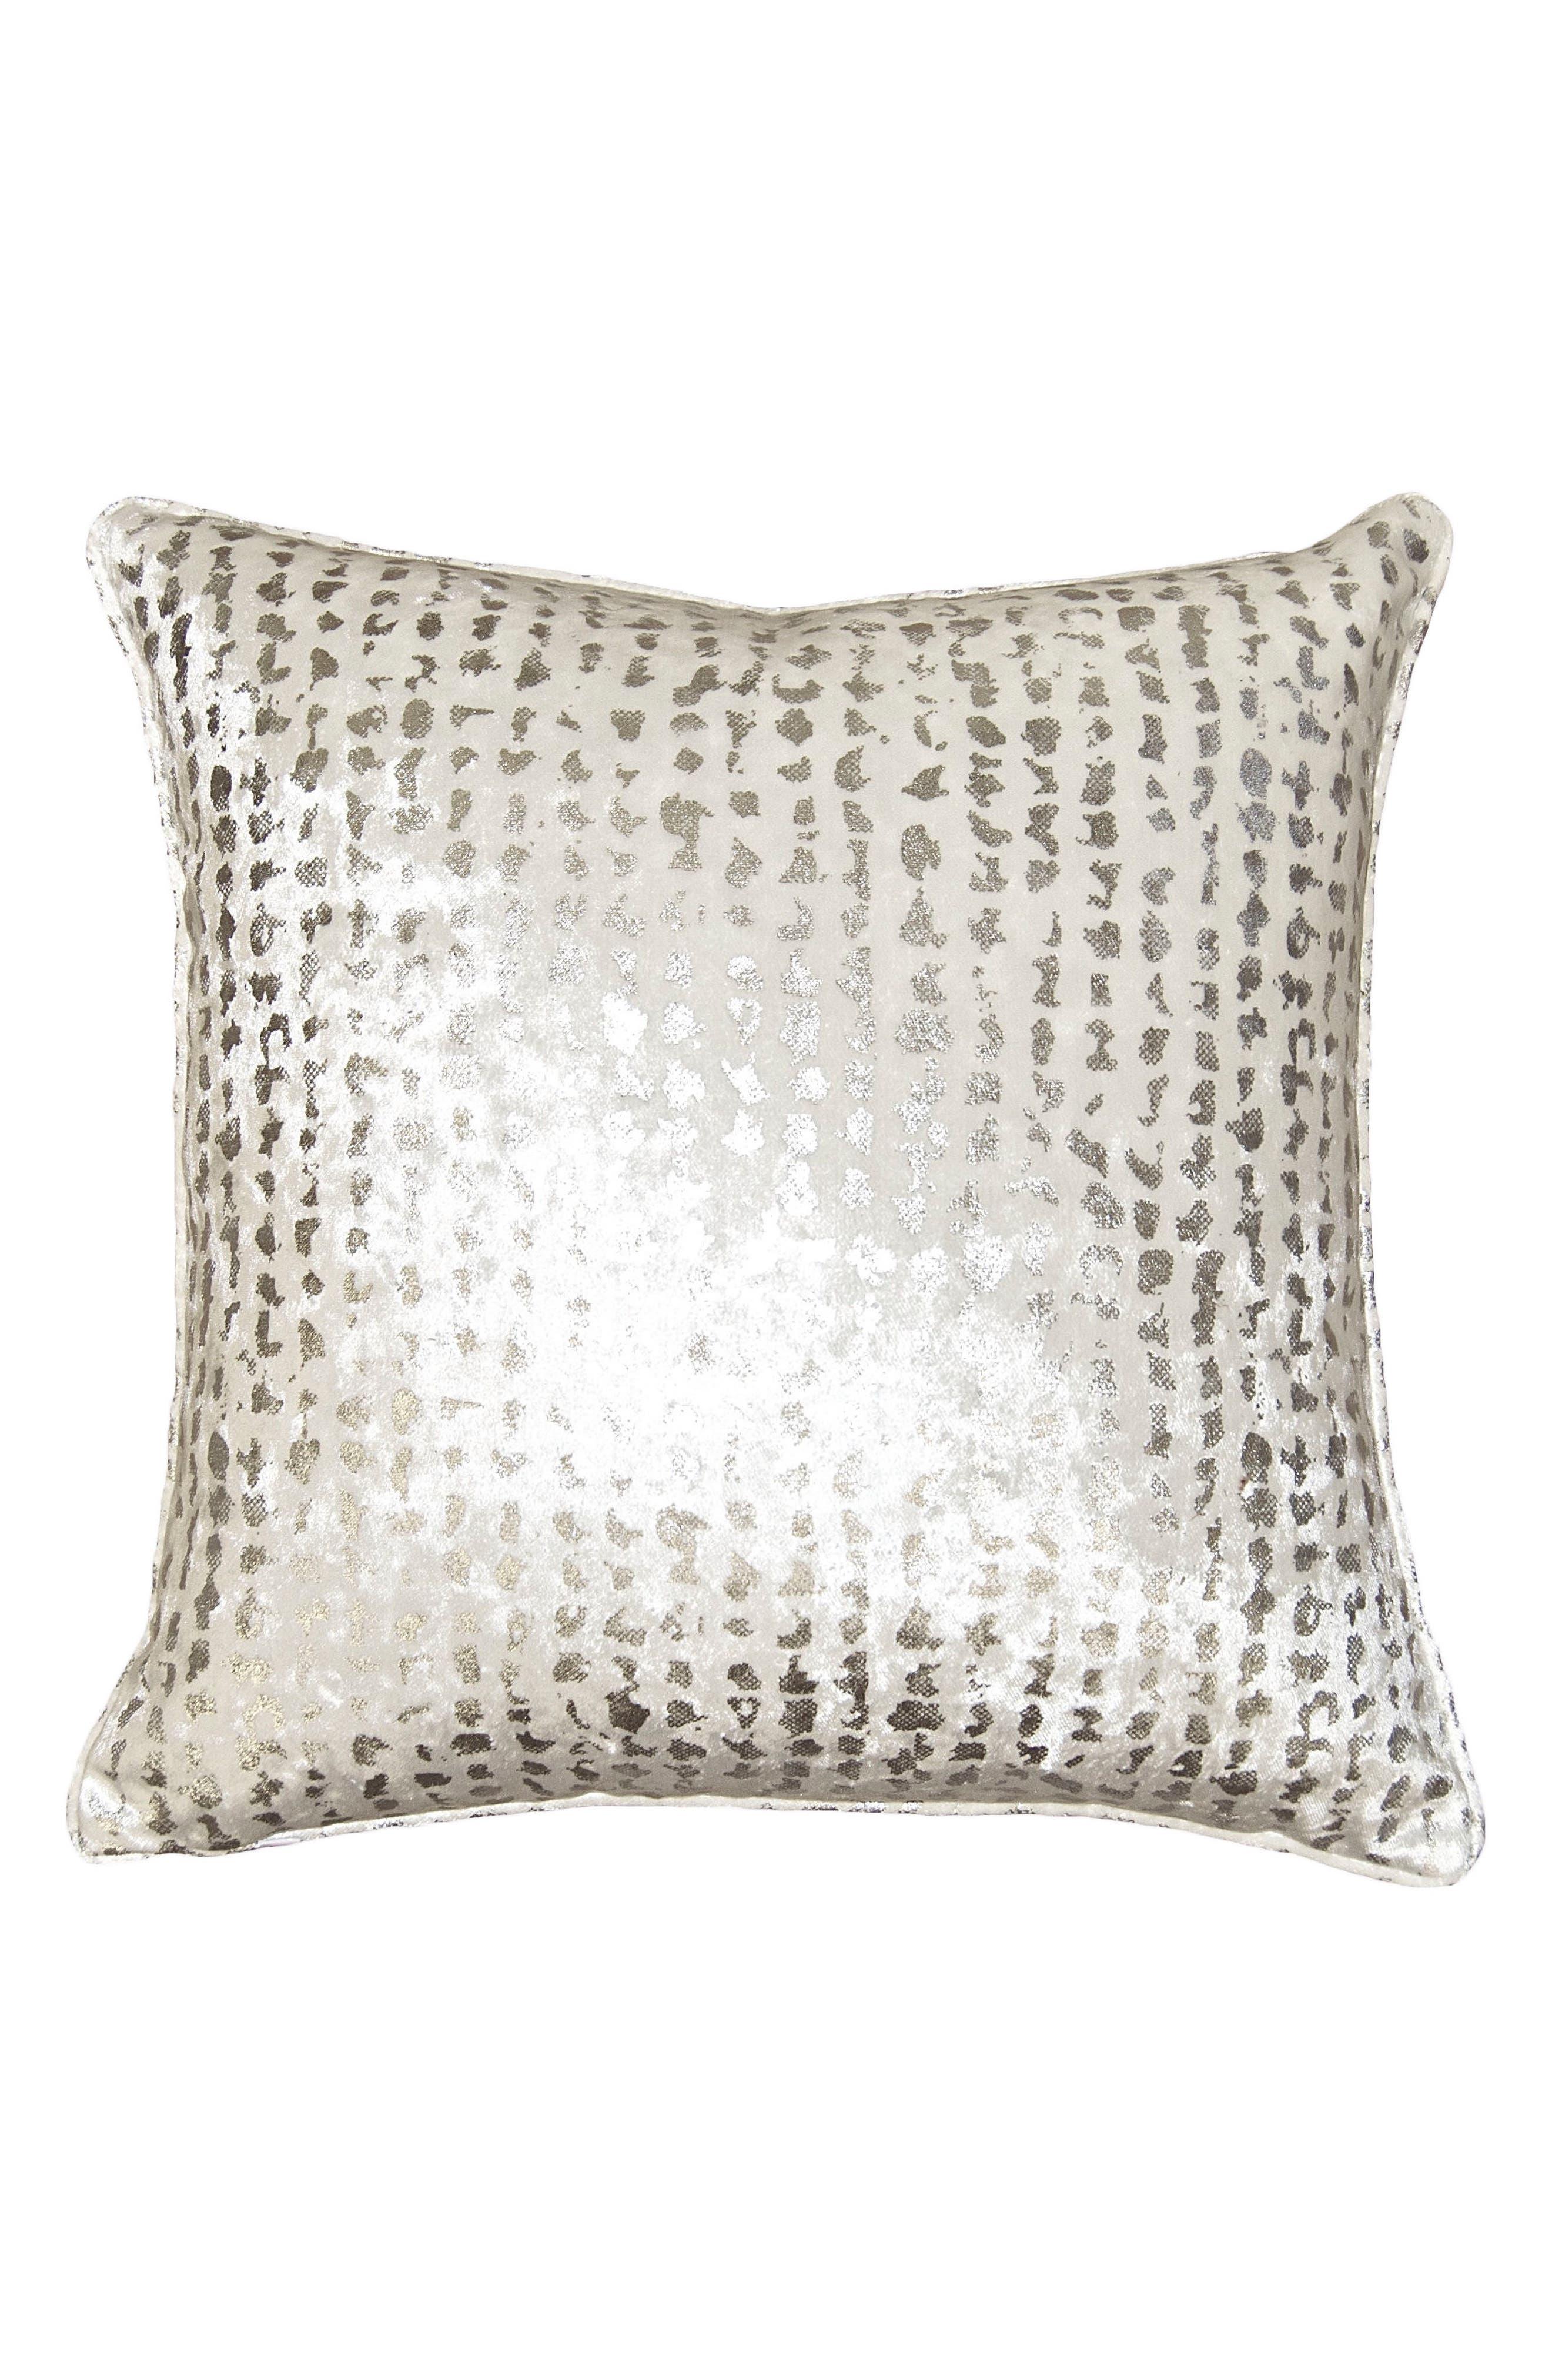 Silver Dots Accent Pillow,                             Main thumbnail 1, color,                             040